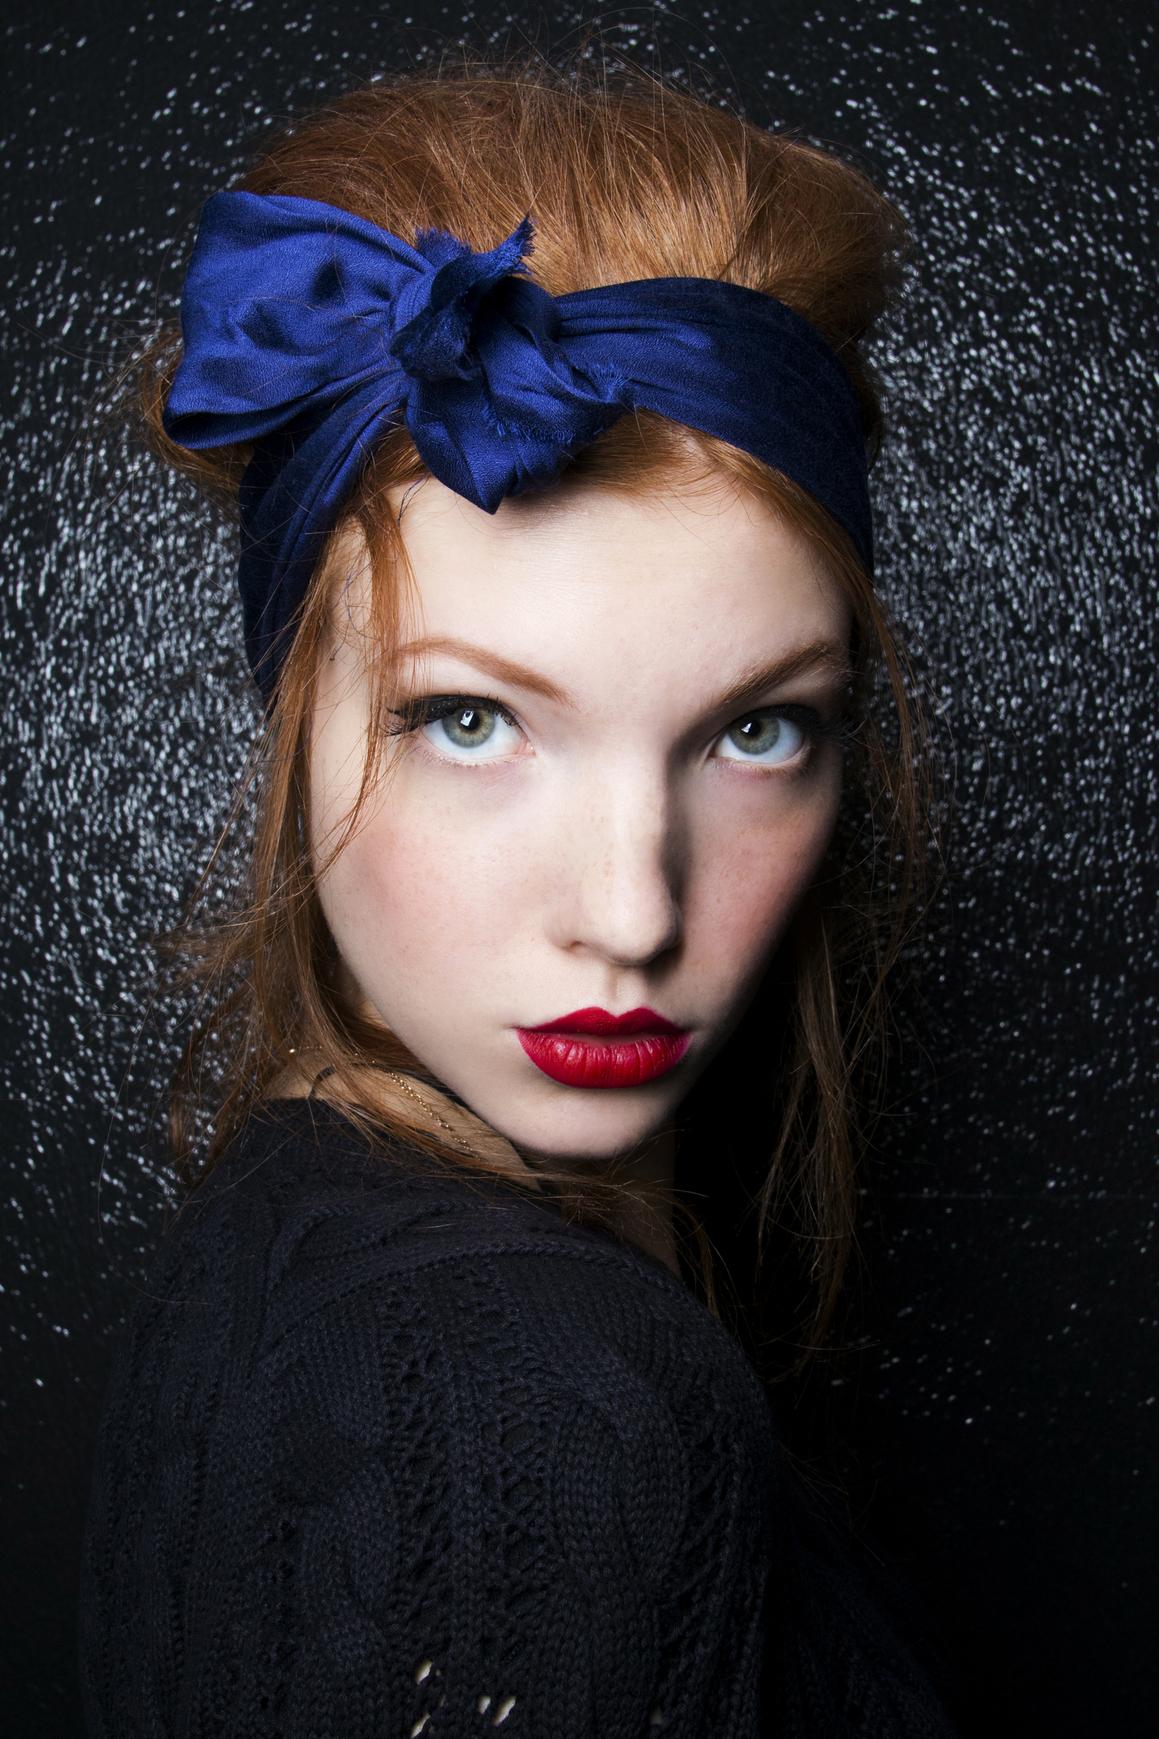 Mabille hair bow